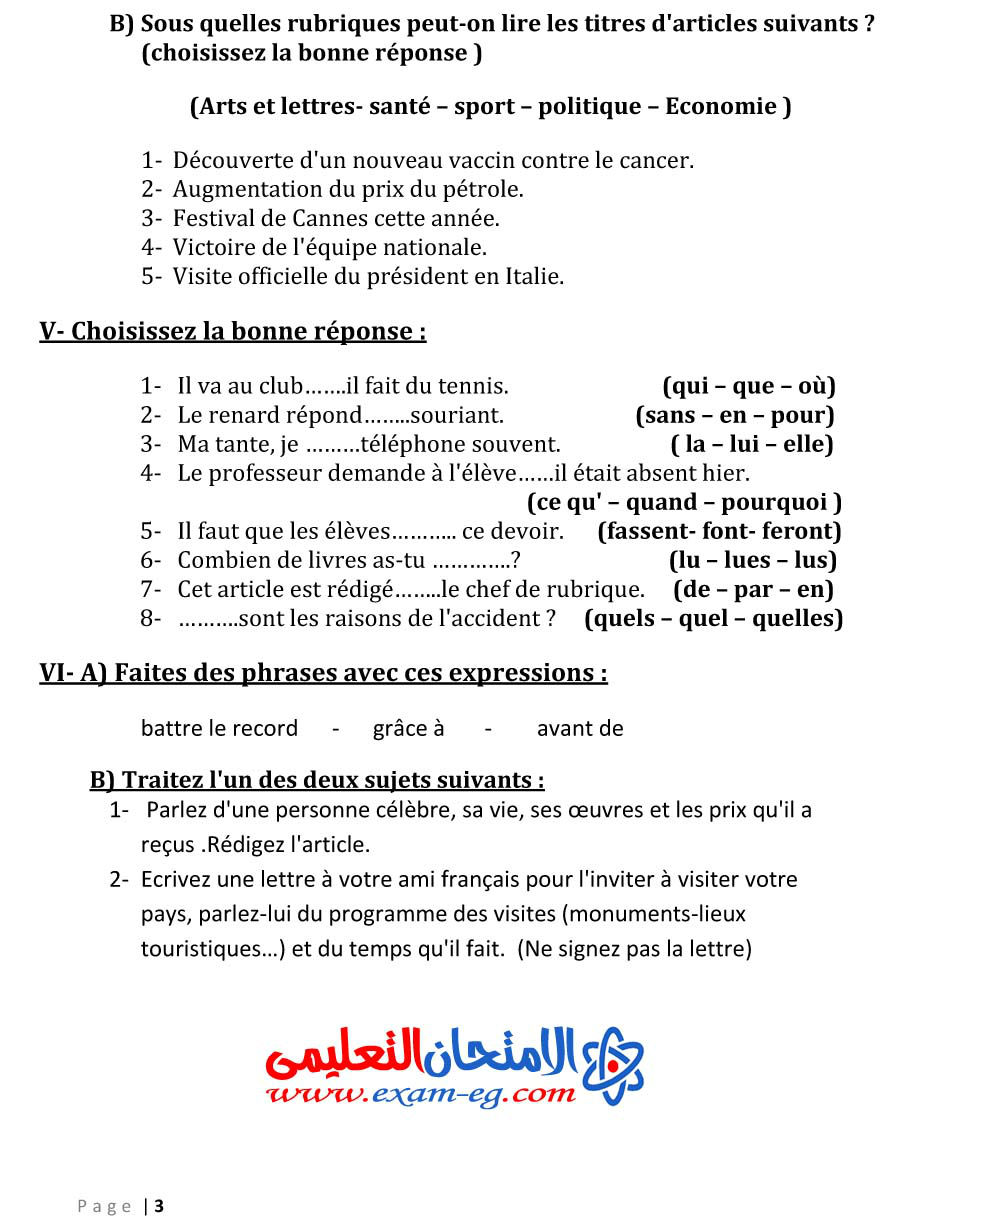 exam-eg.com_1396623604863.jpg